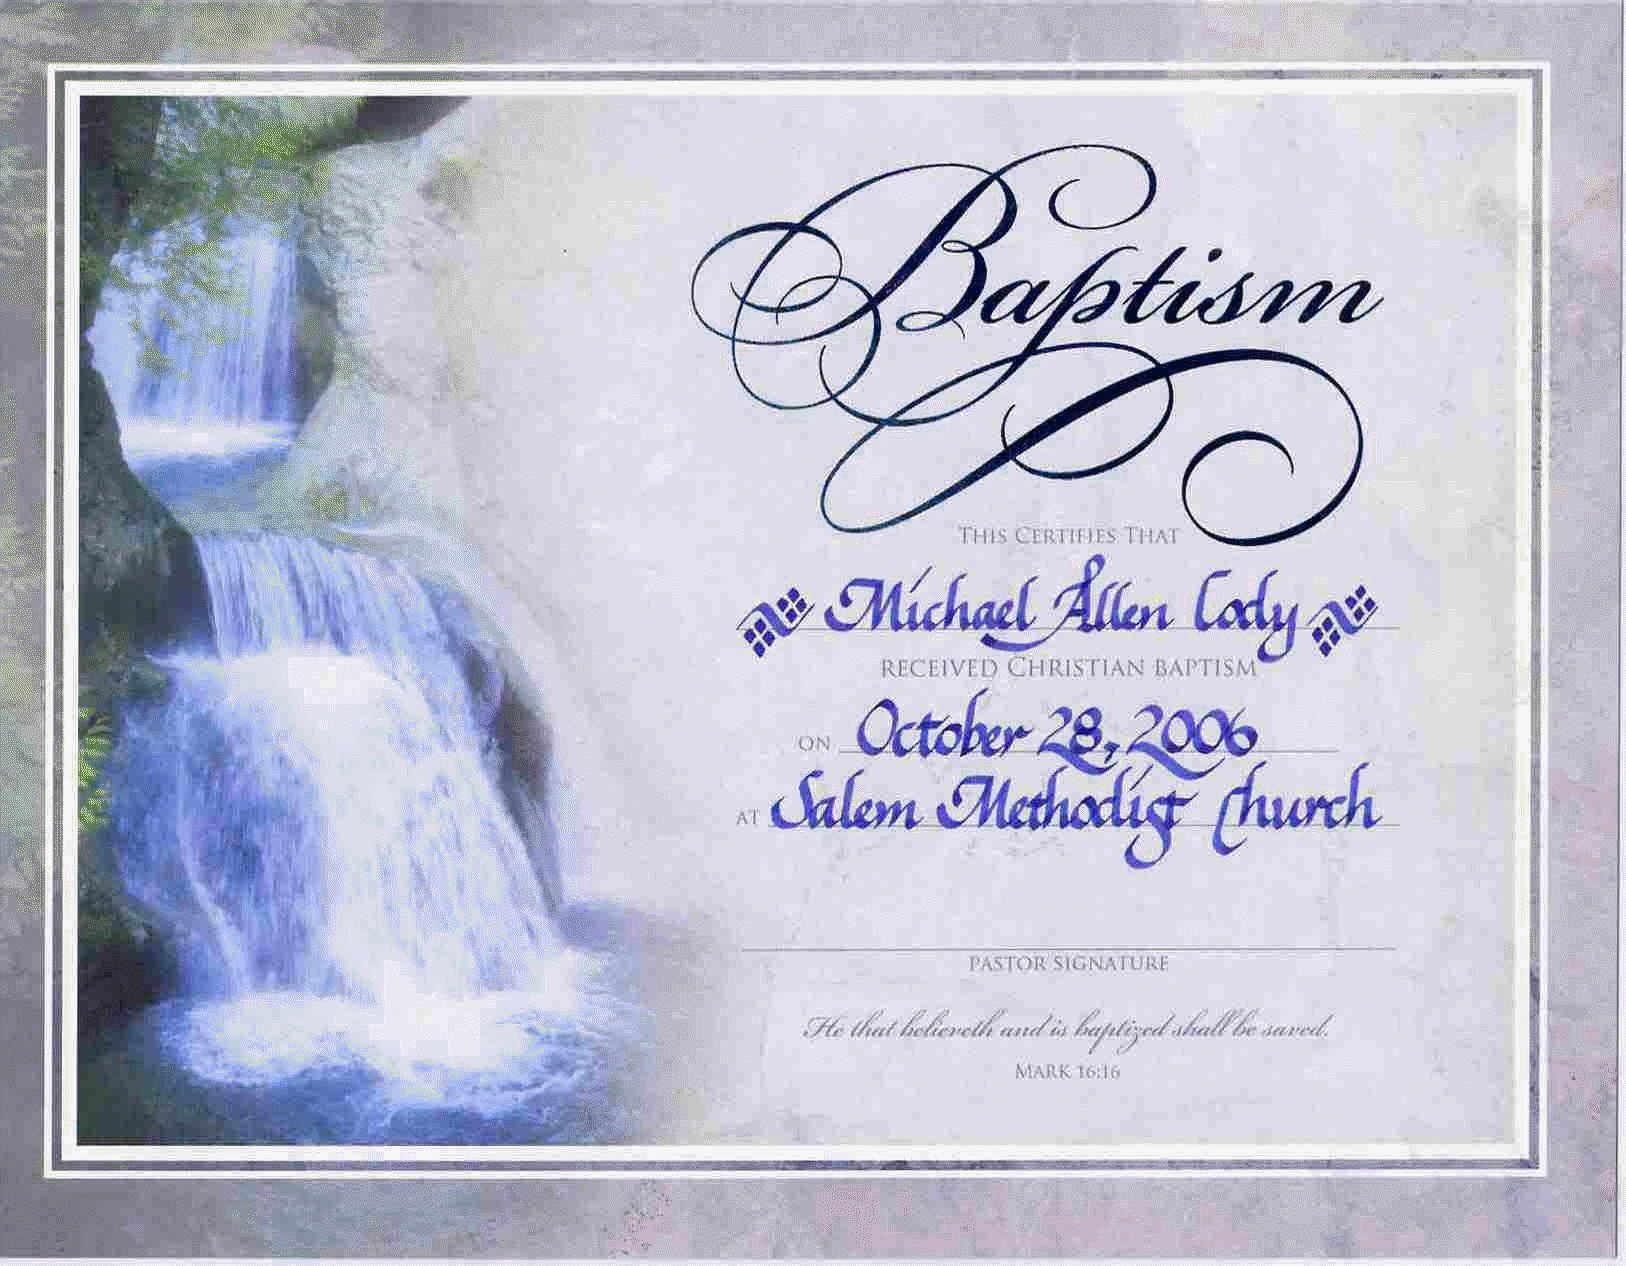 Water Baptism Certificate Templateencephaloscom Encephaloscom - Free Online Printable Baptism Certificates